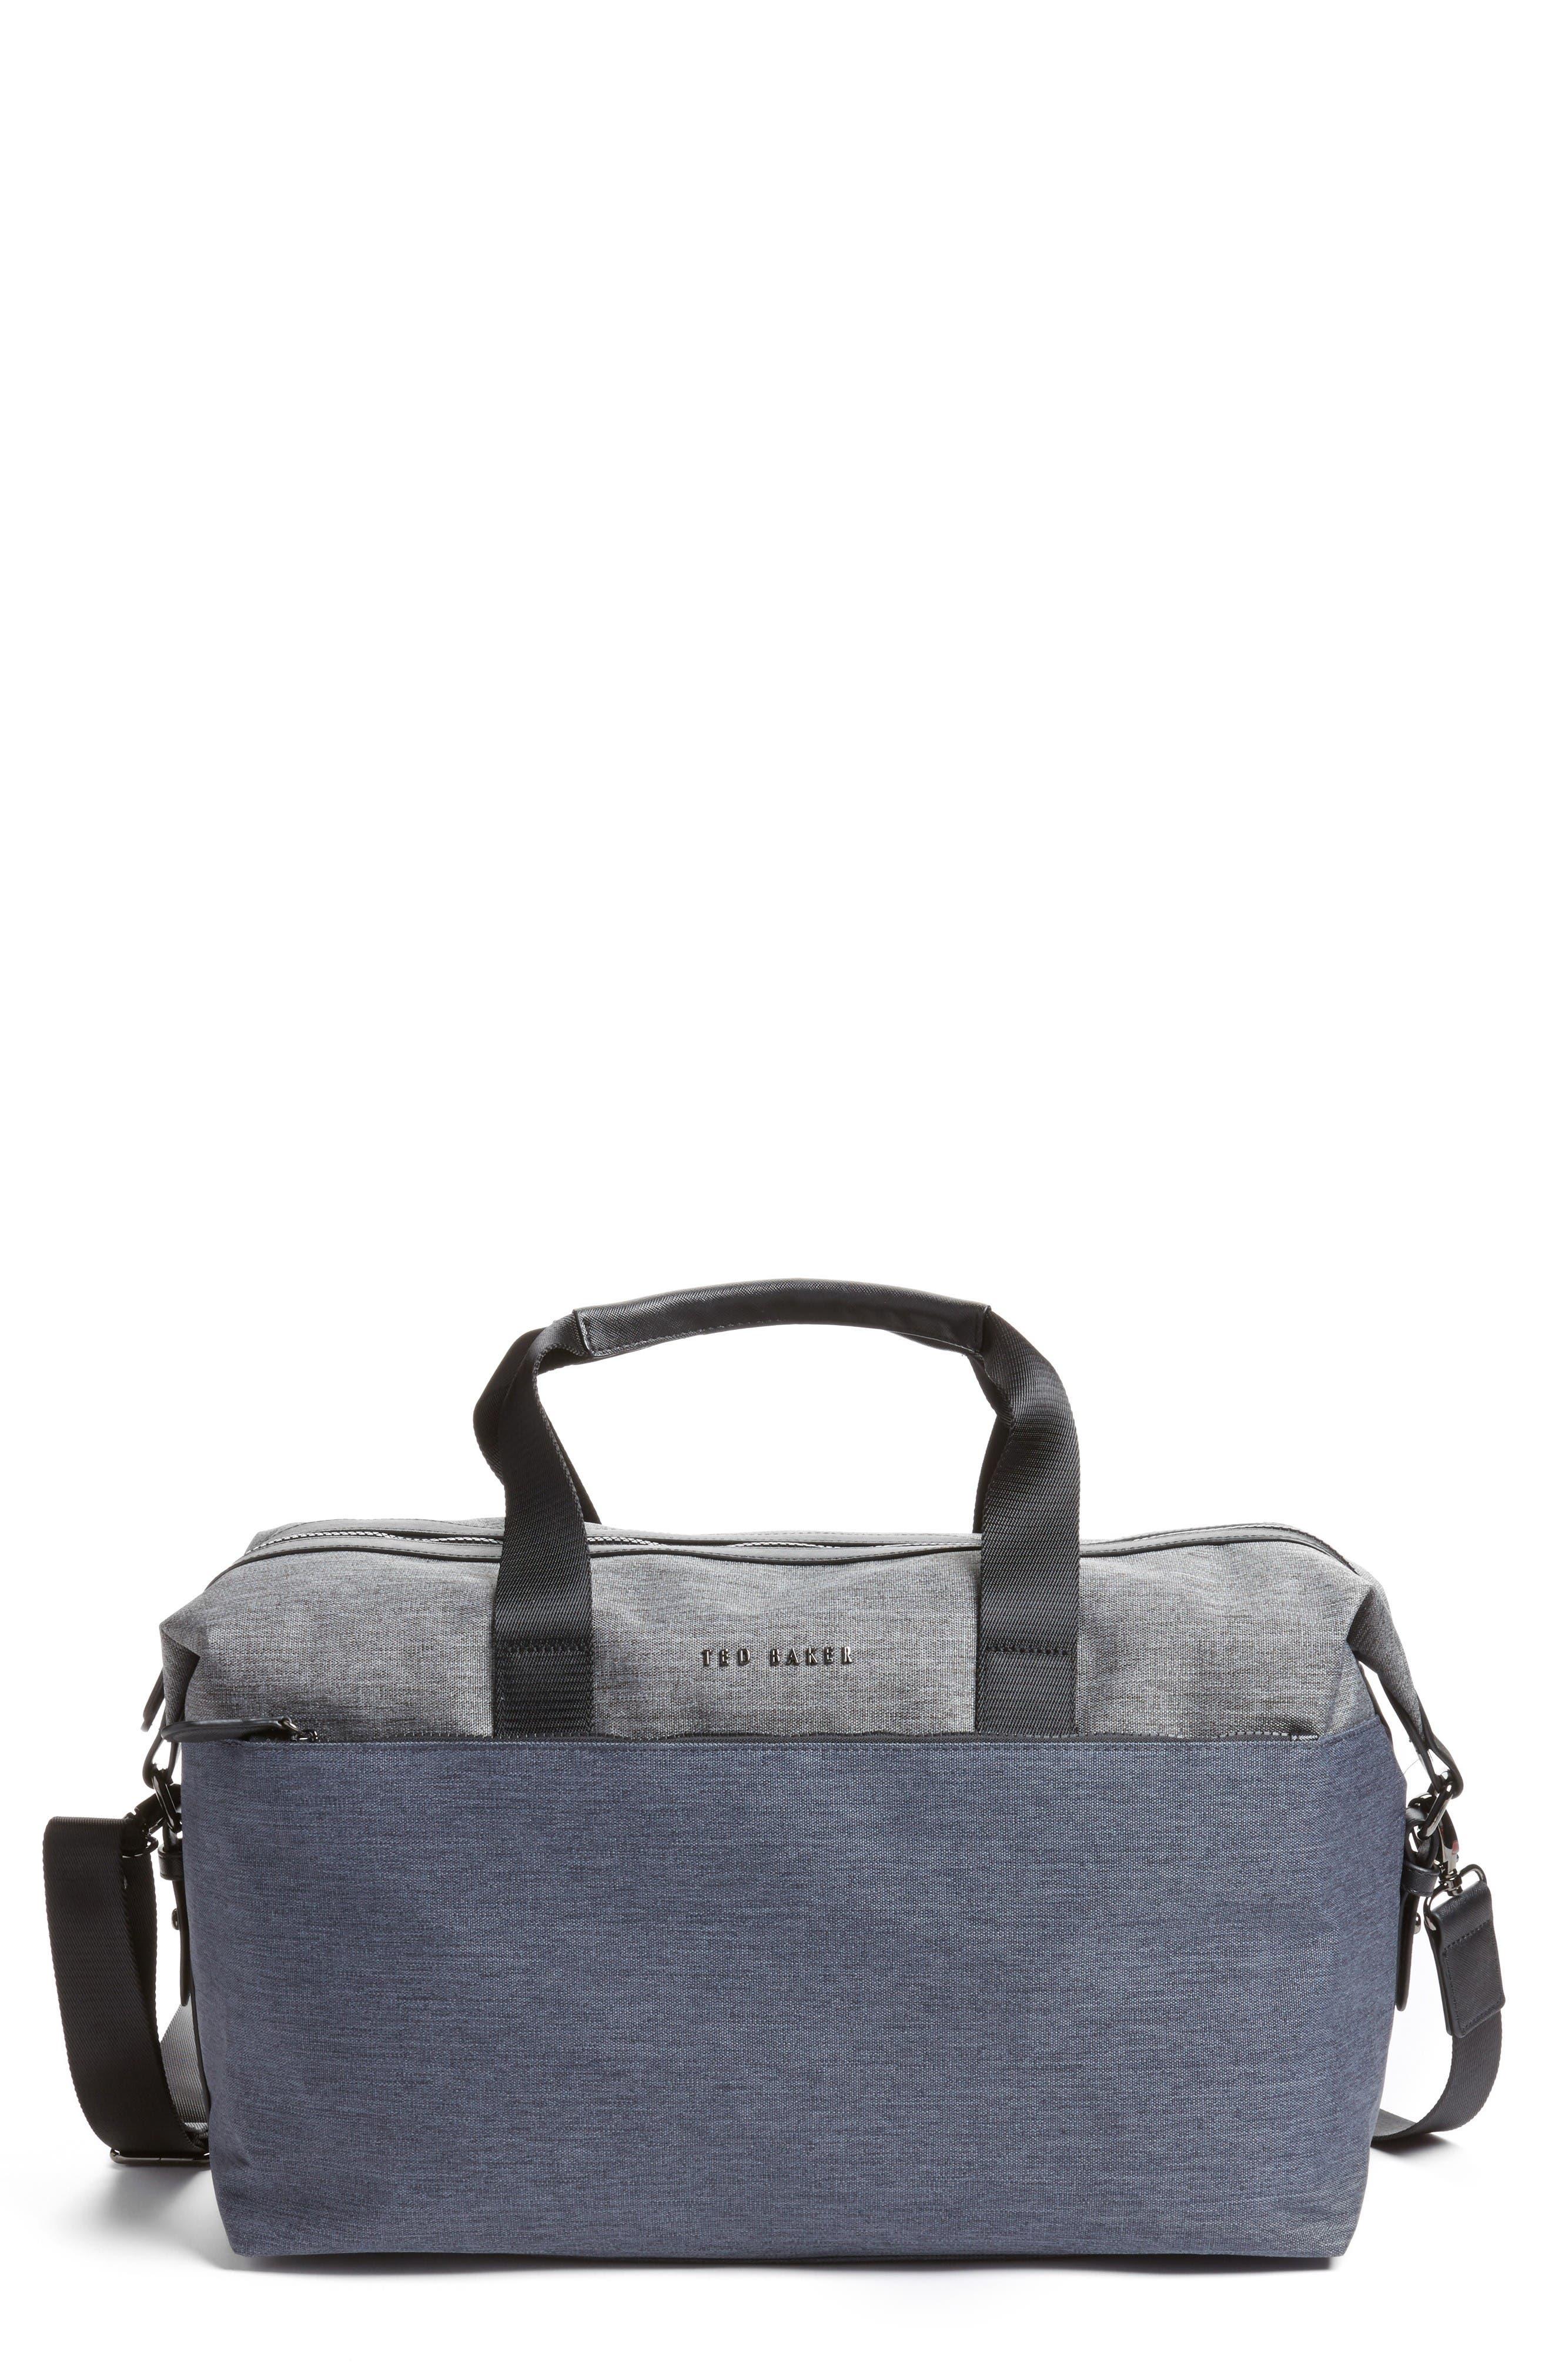 Alternate Image 1 Selected - Ted Baker London Hamahed Duffel Bag